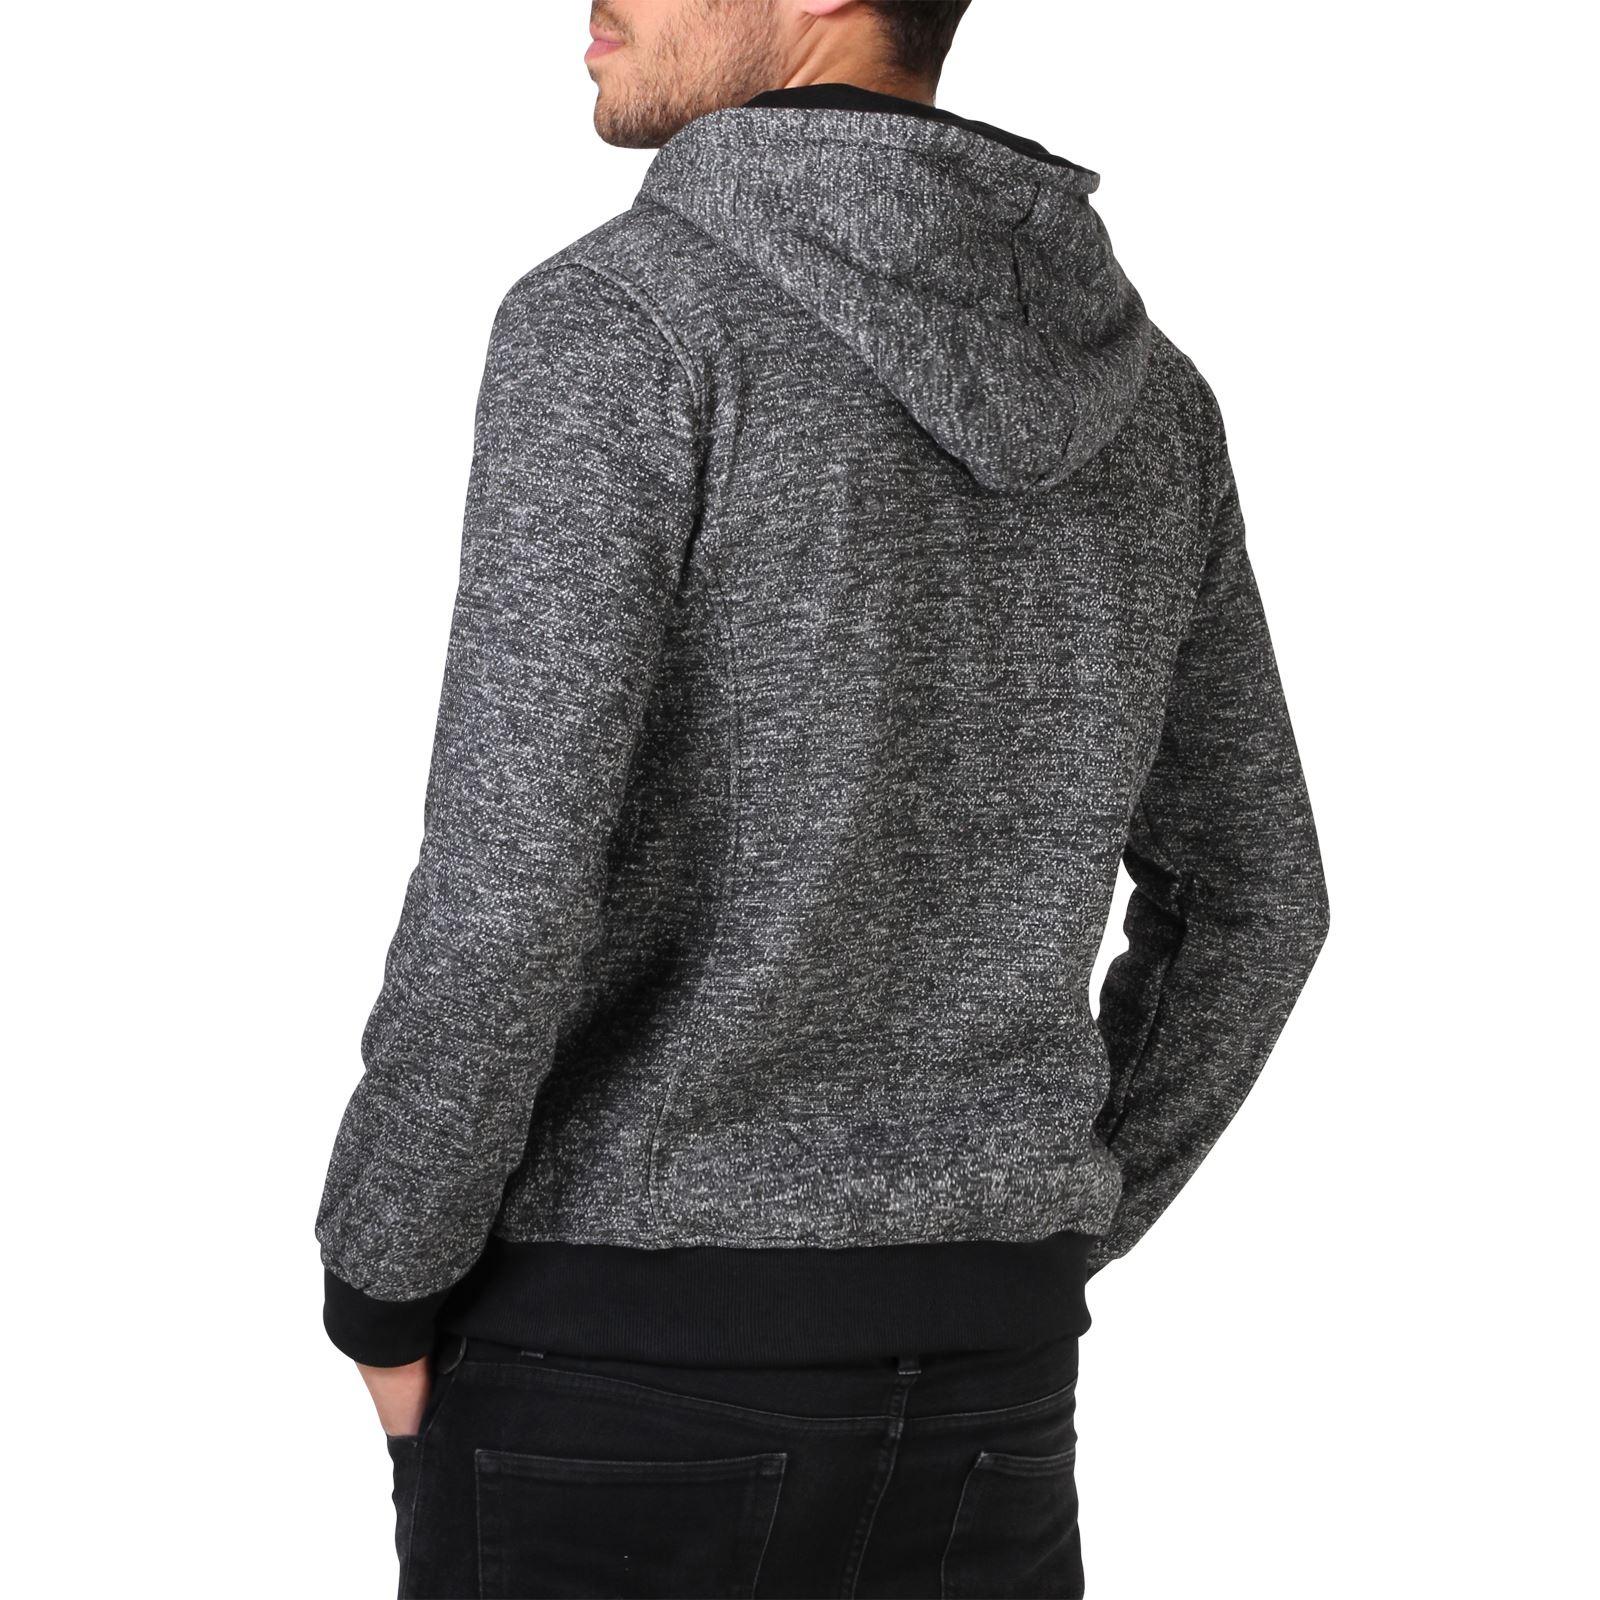 Best quality hoodies